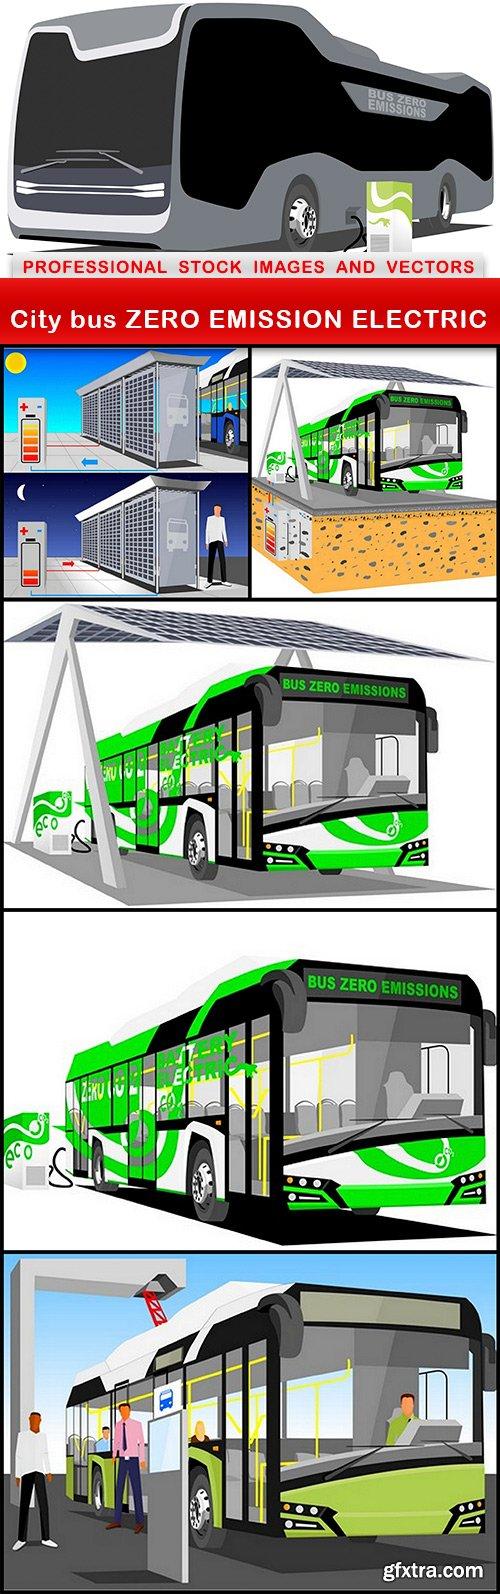 City bus ZERO EMISSION ELECTRIC - 6 EPS